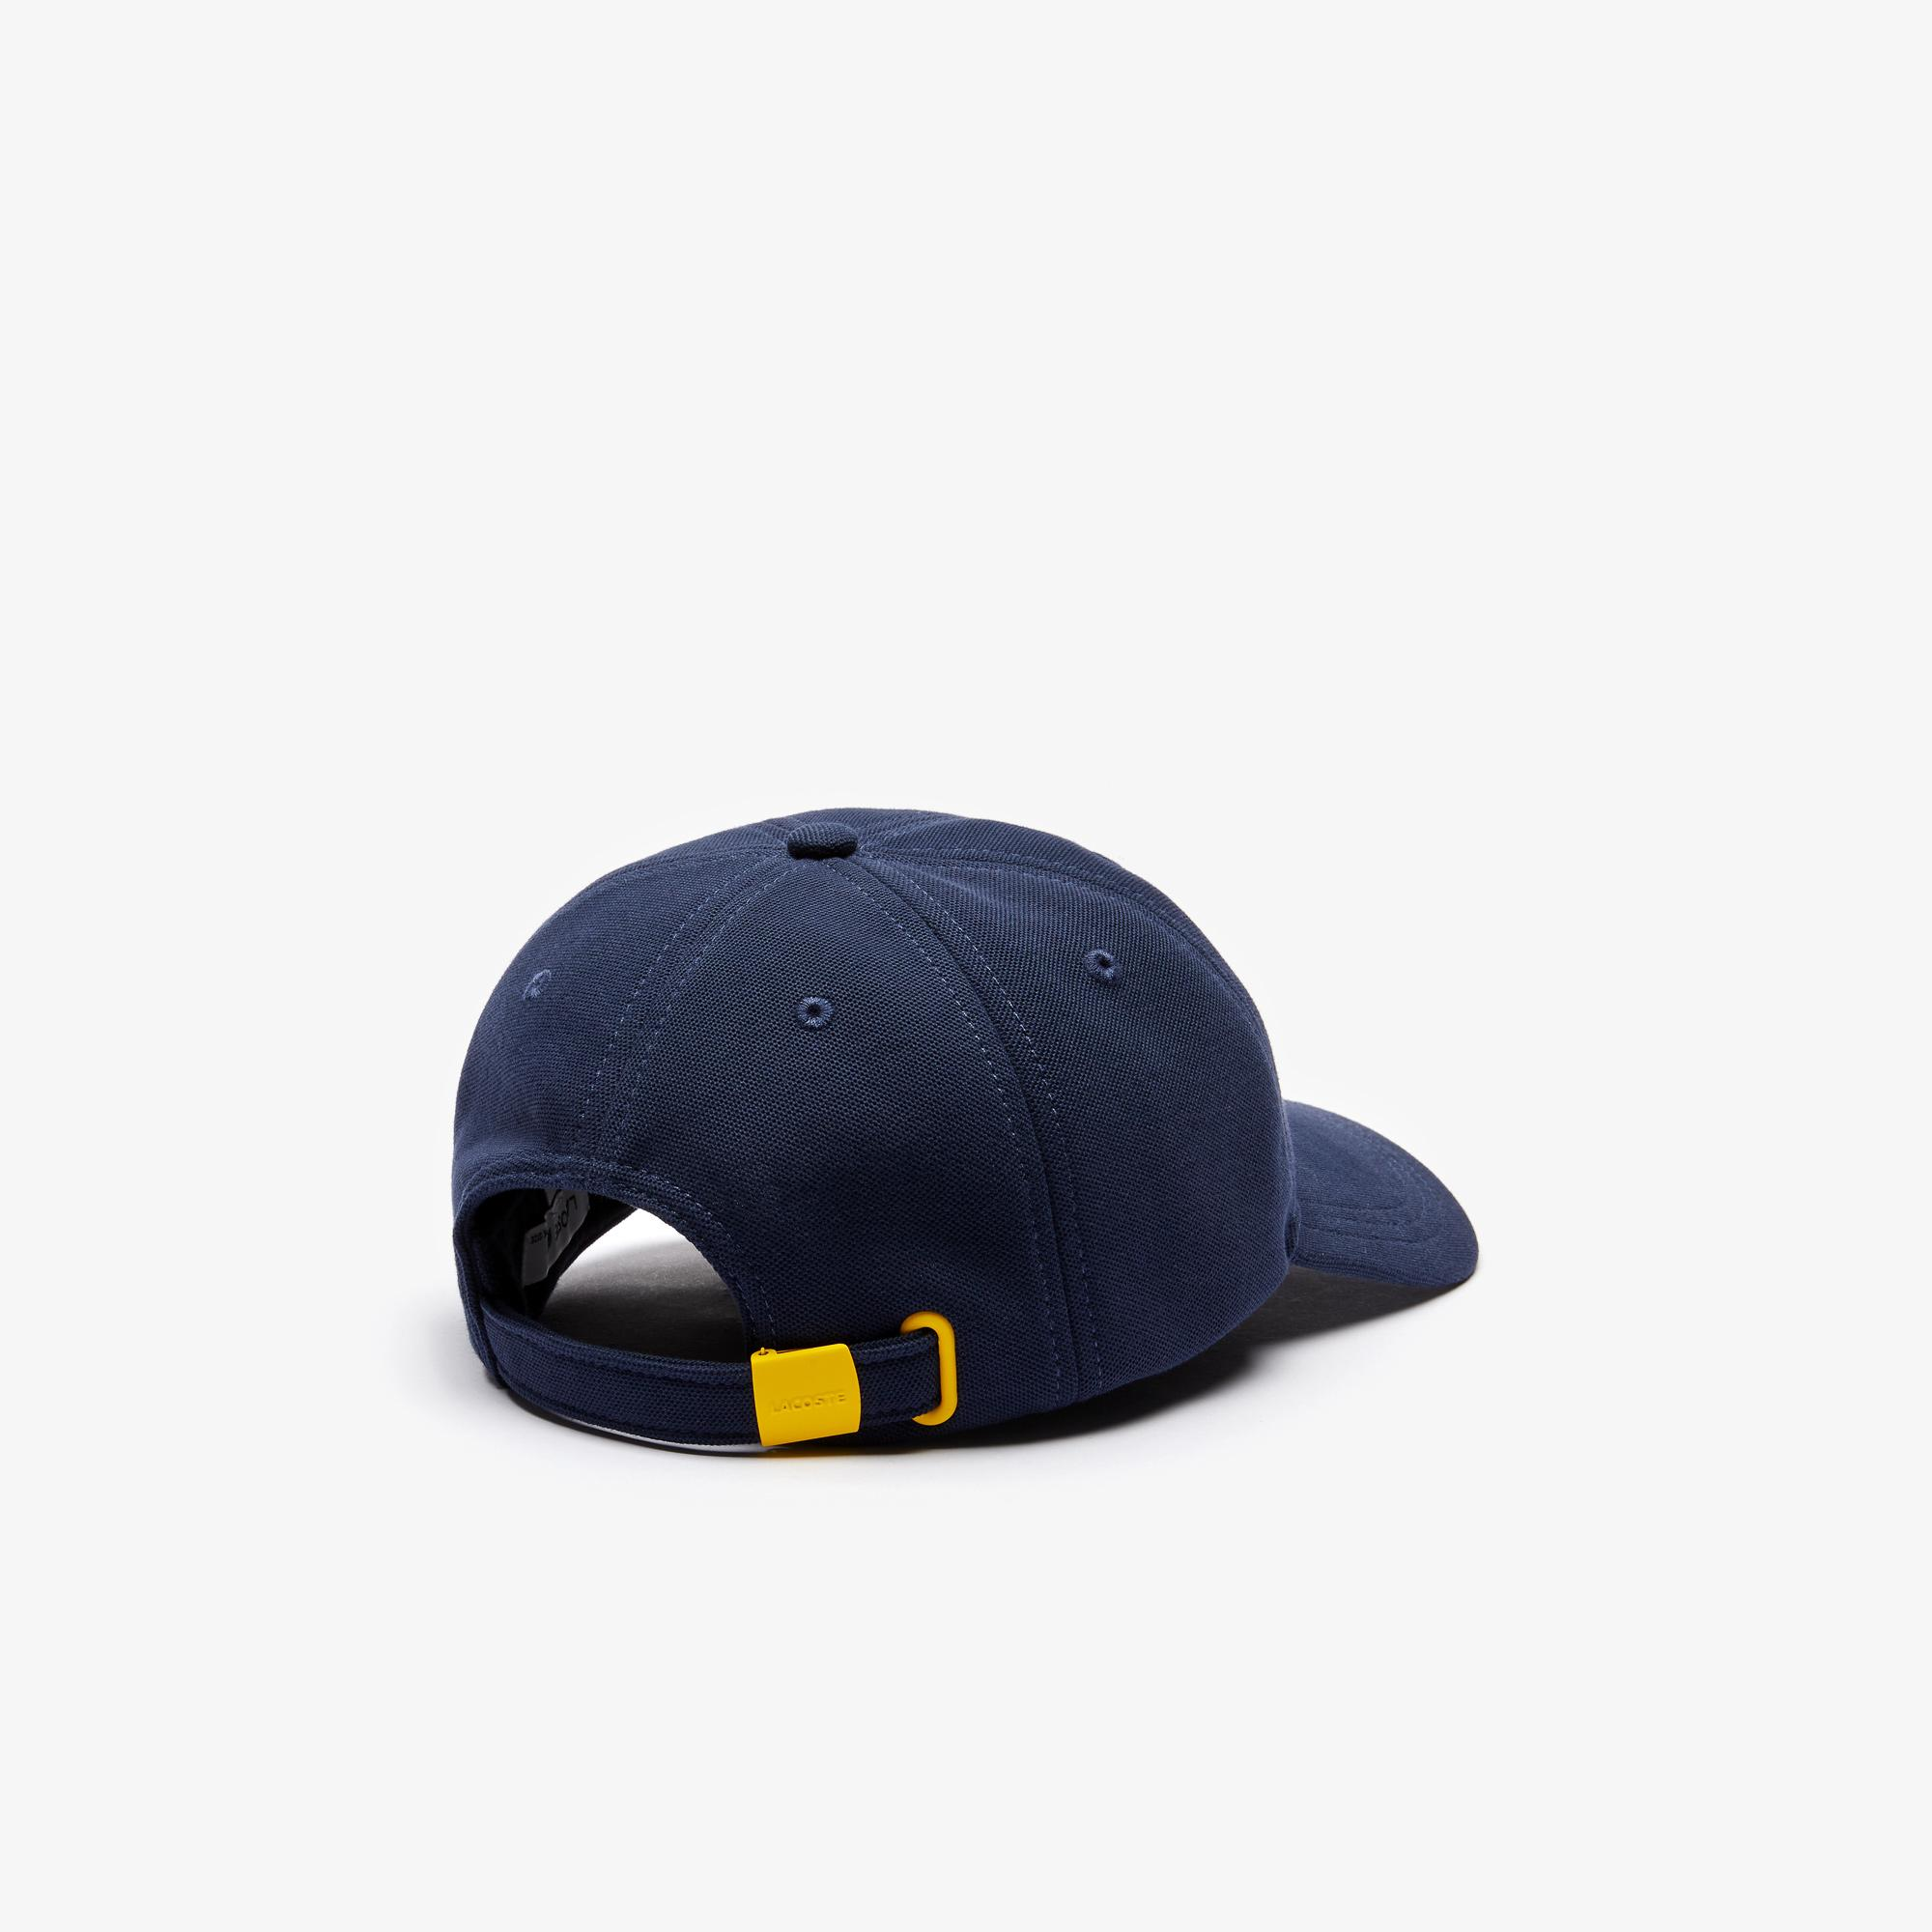 Lacoste x National Geographic Unisex Lacivert Şapka